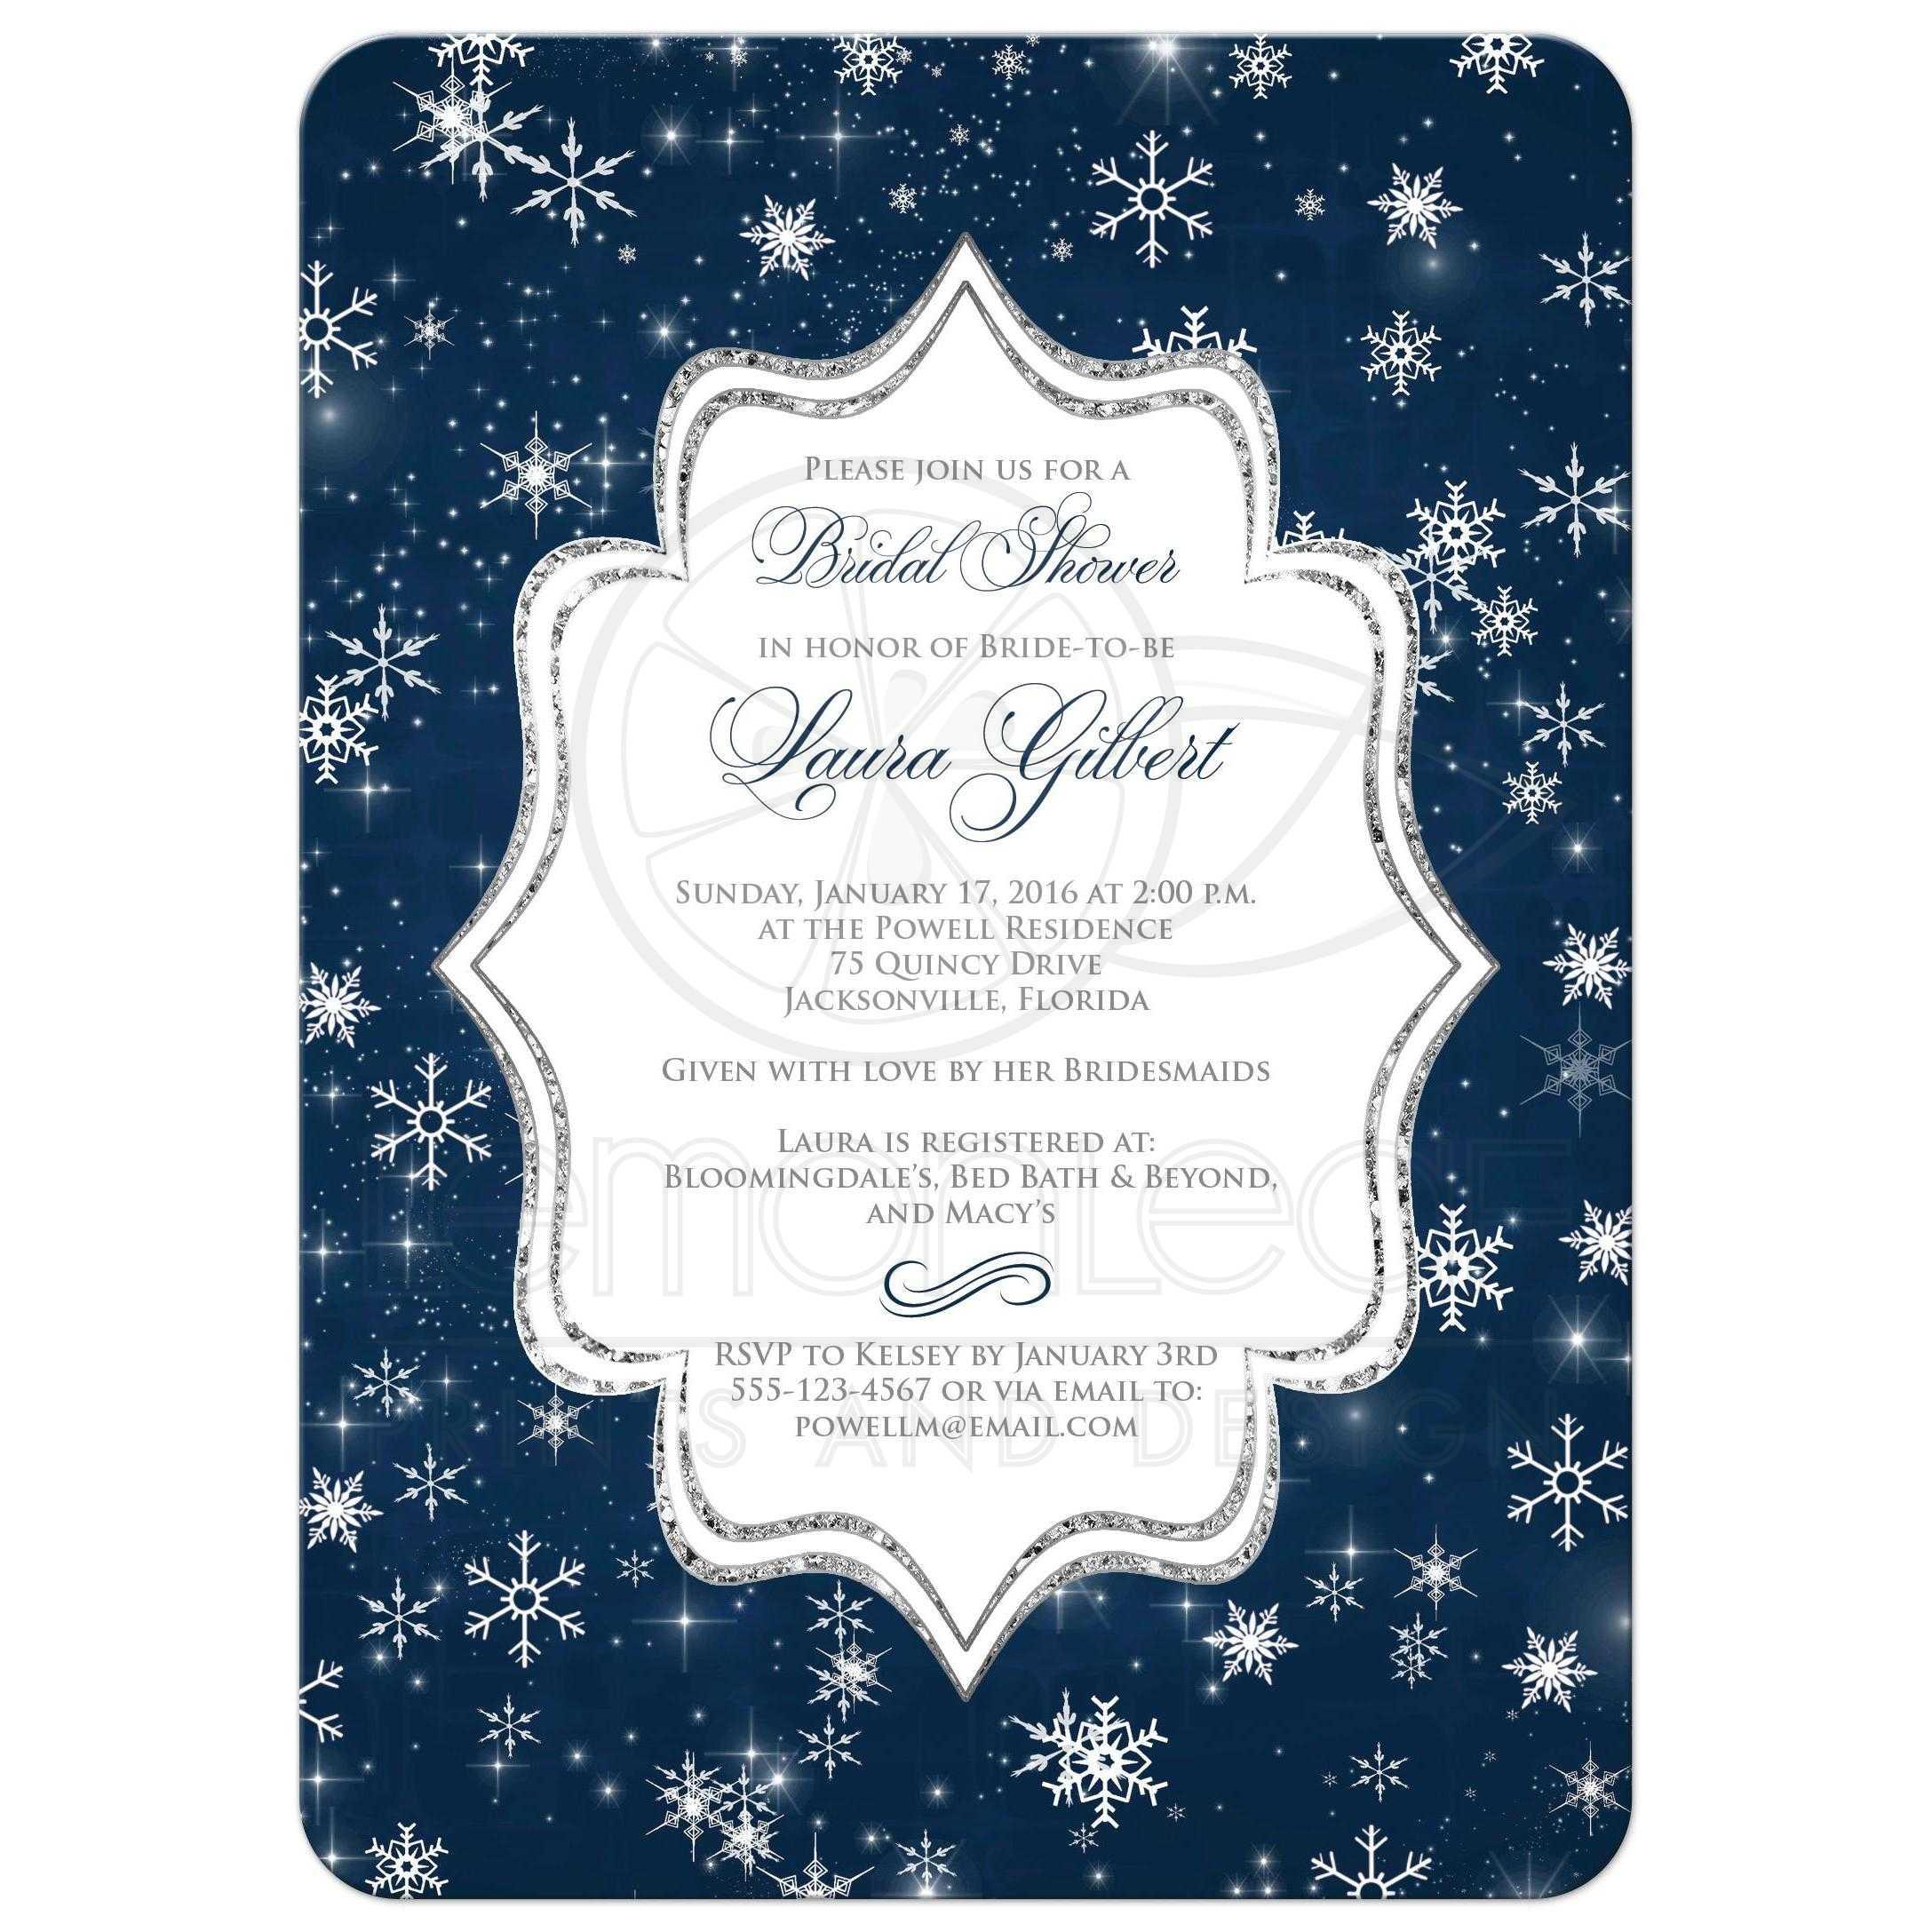 Winter Bridal Shower Invitation A Wintry Night Navy